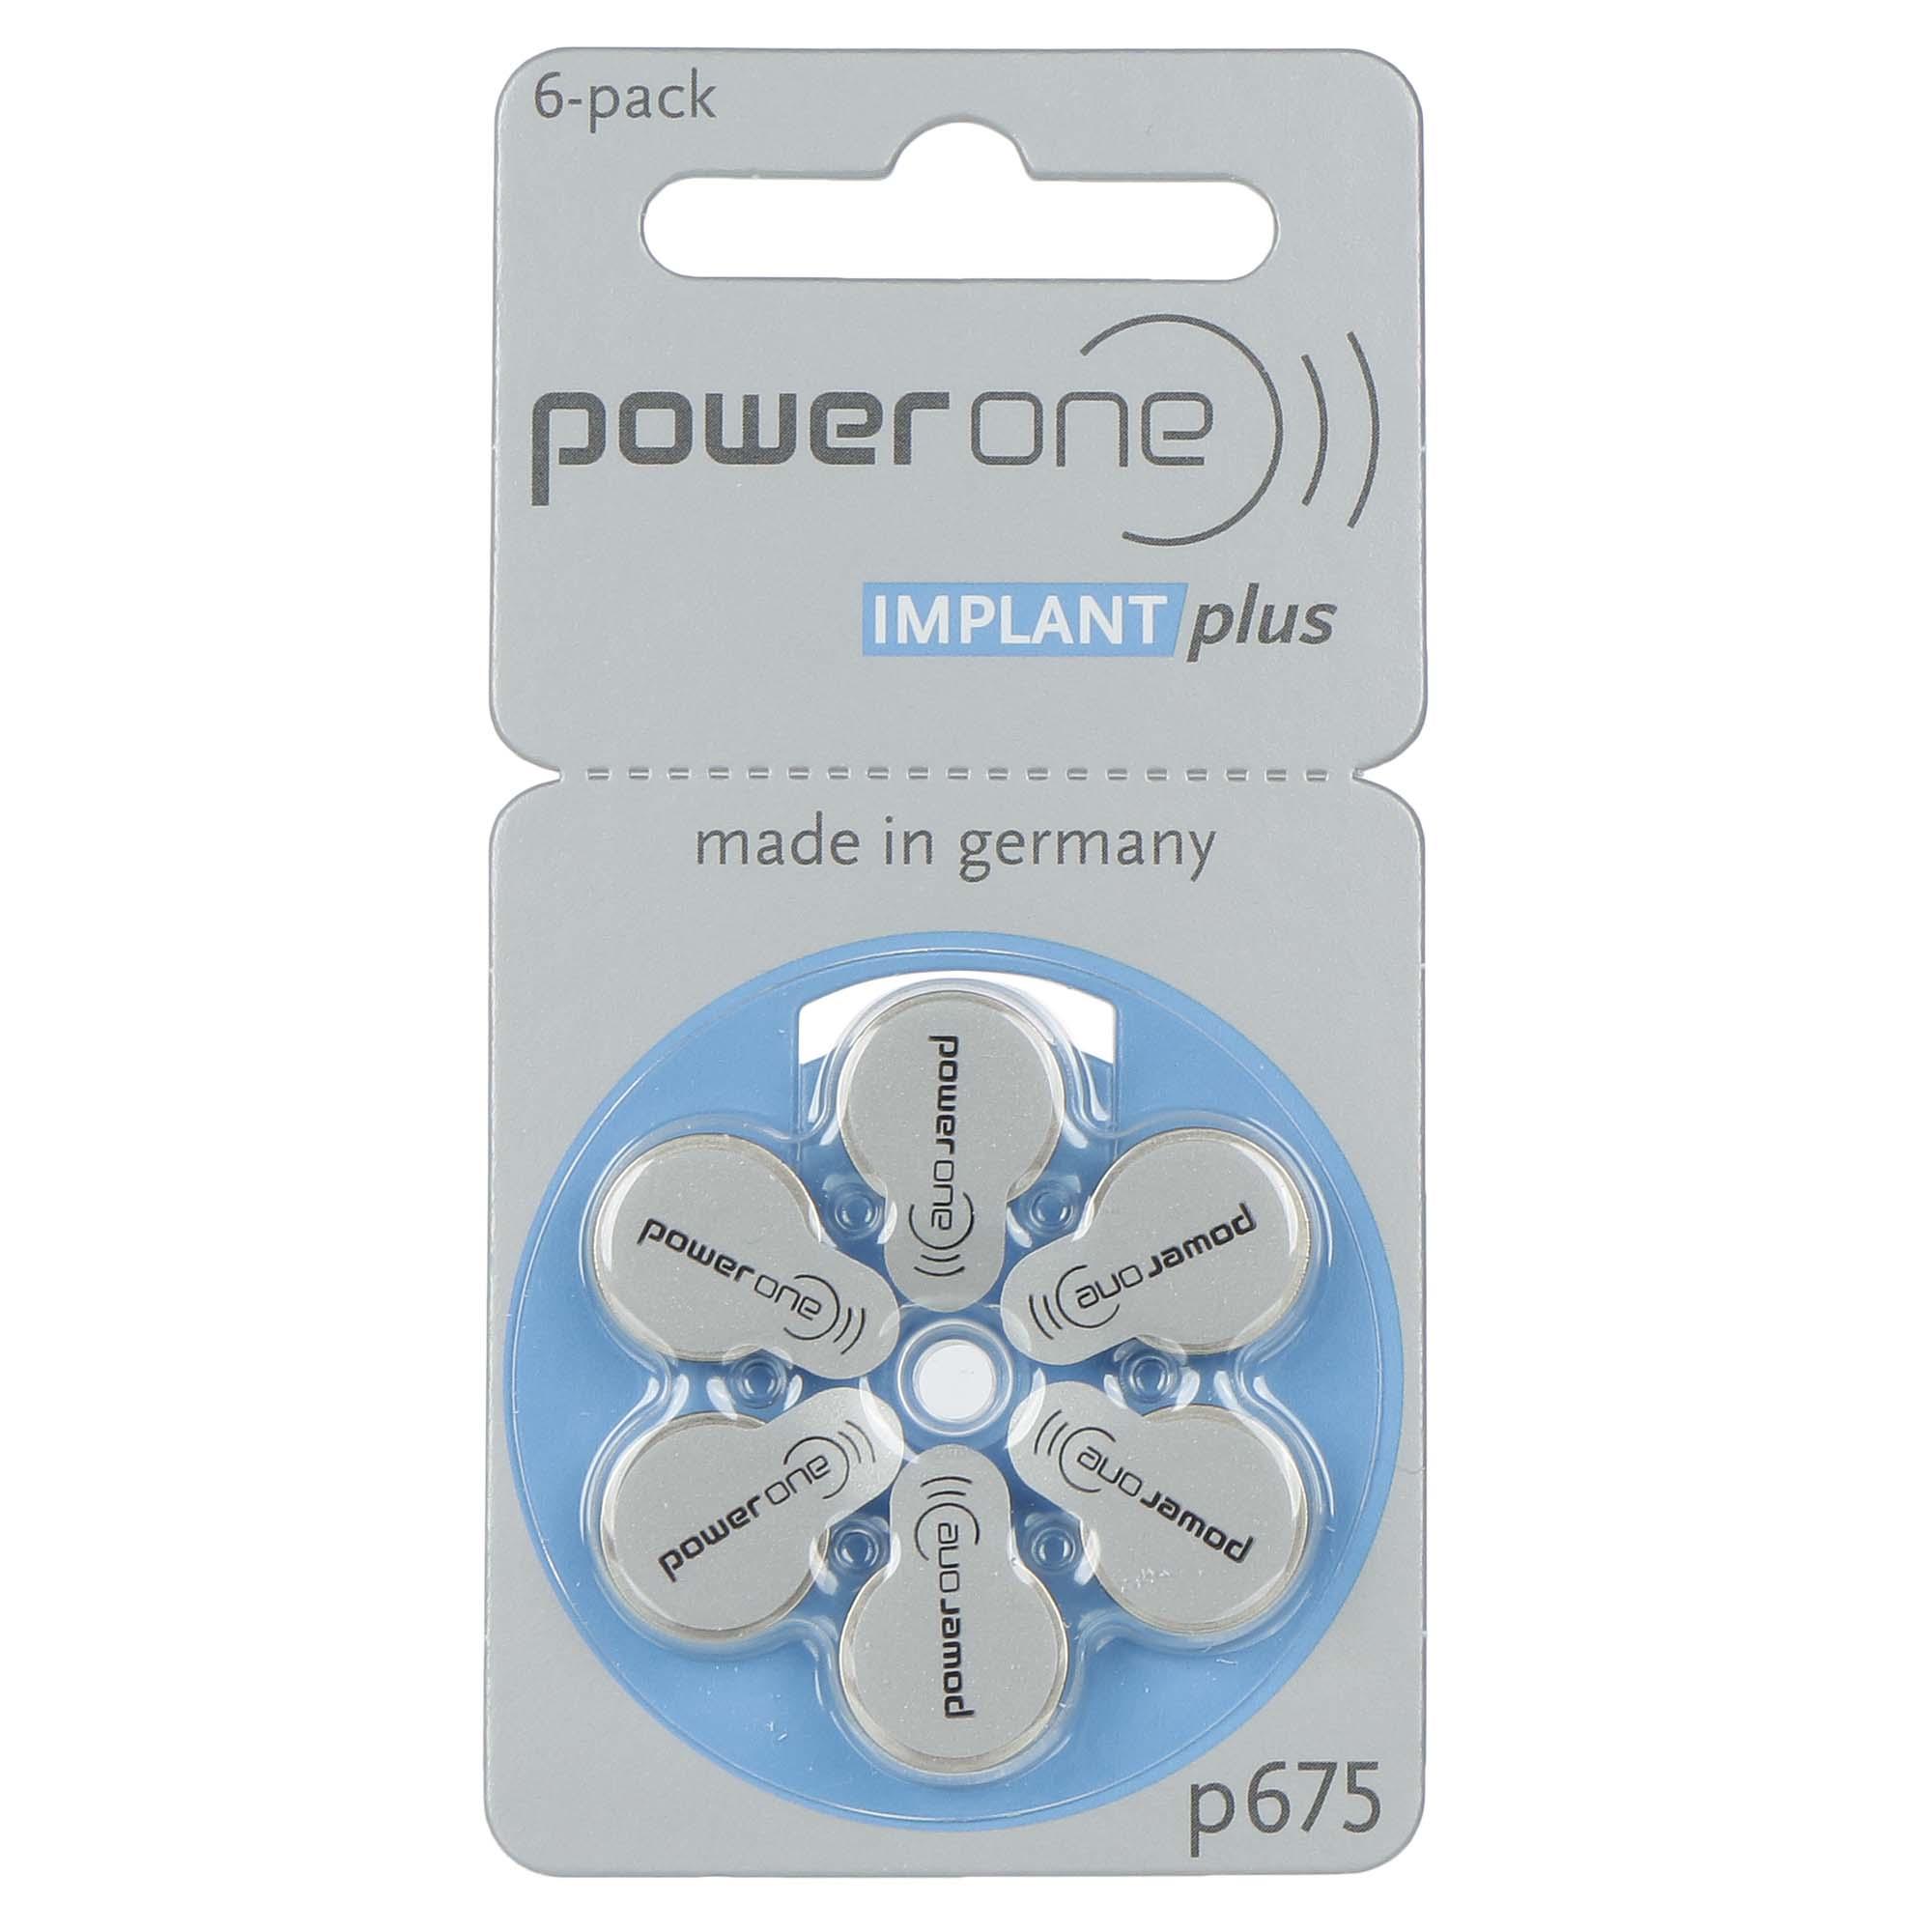 PowerOne P675 (IMPLANT PLUS)  - 1 Cartela - 6 Baterias para Implante Coclear  - SONORA